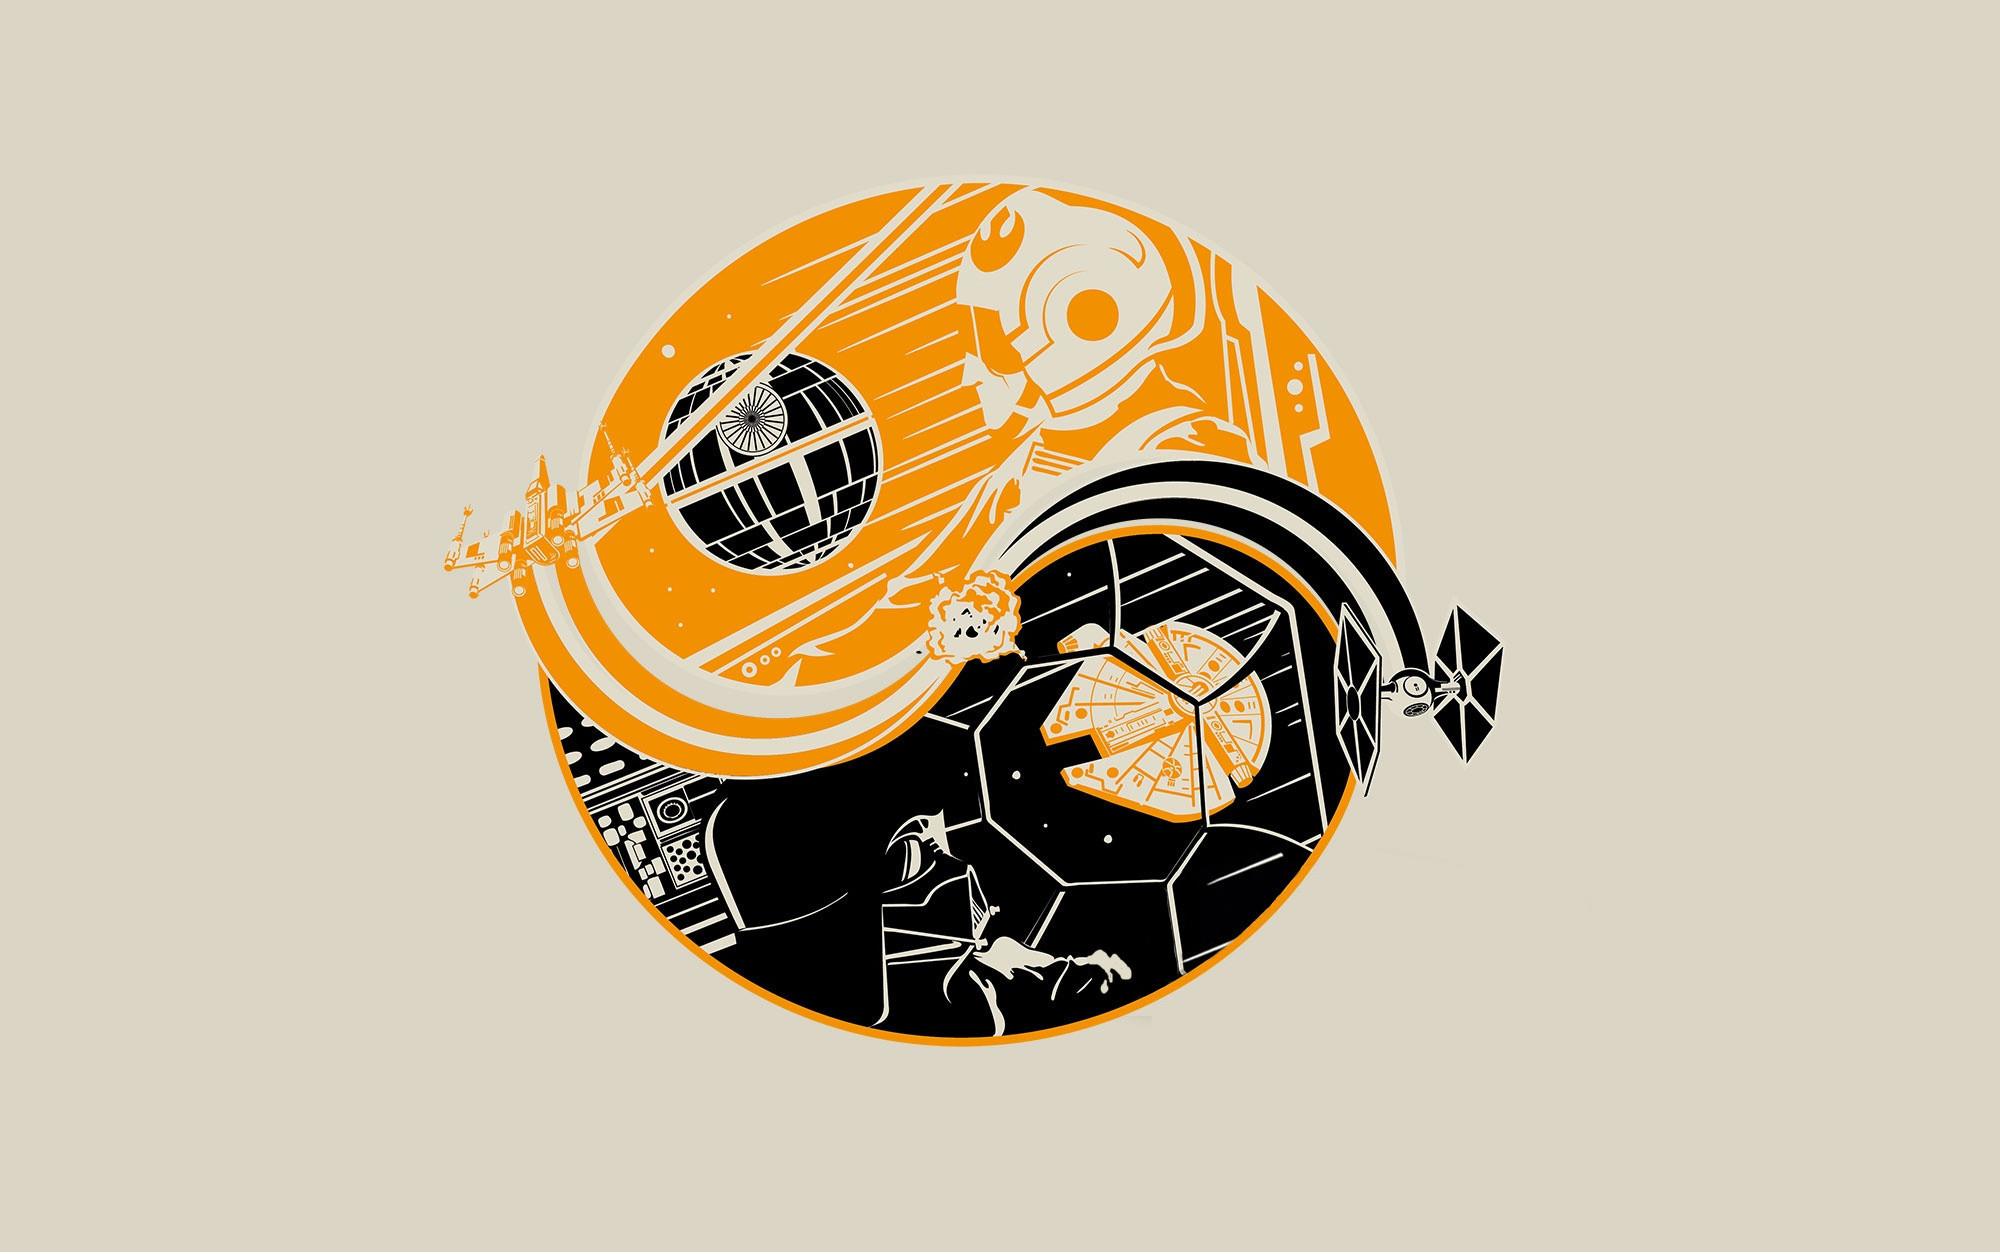 Star Wars Yin Yang Wallpaper – Death of a Star/Birth of a Hero